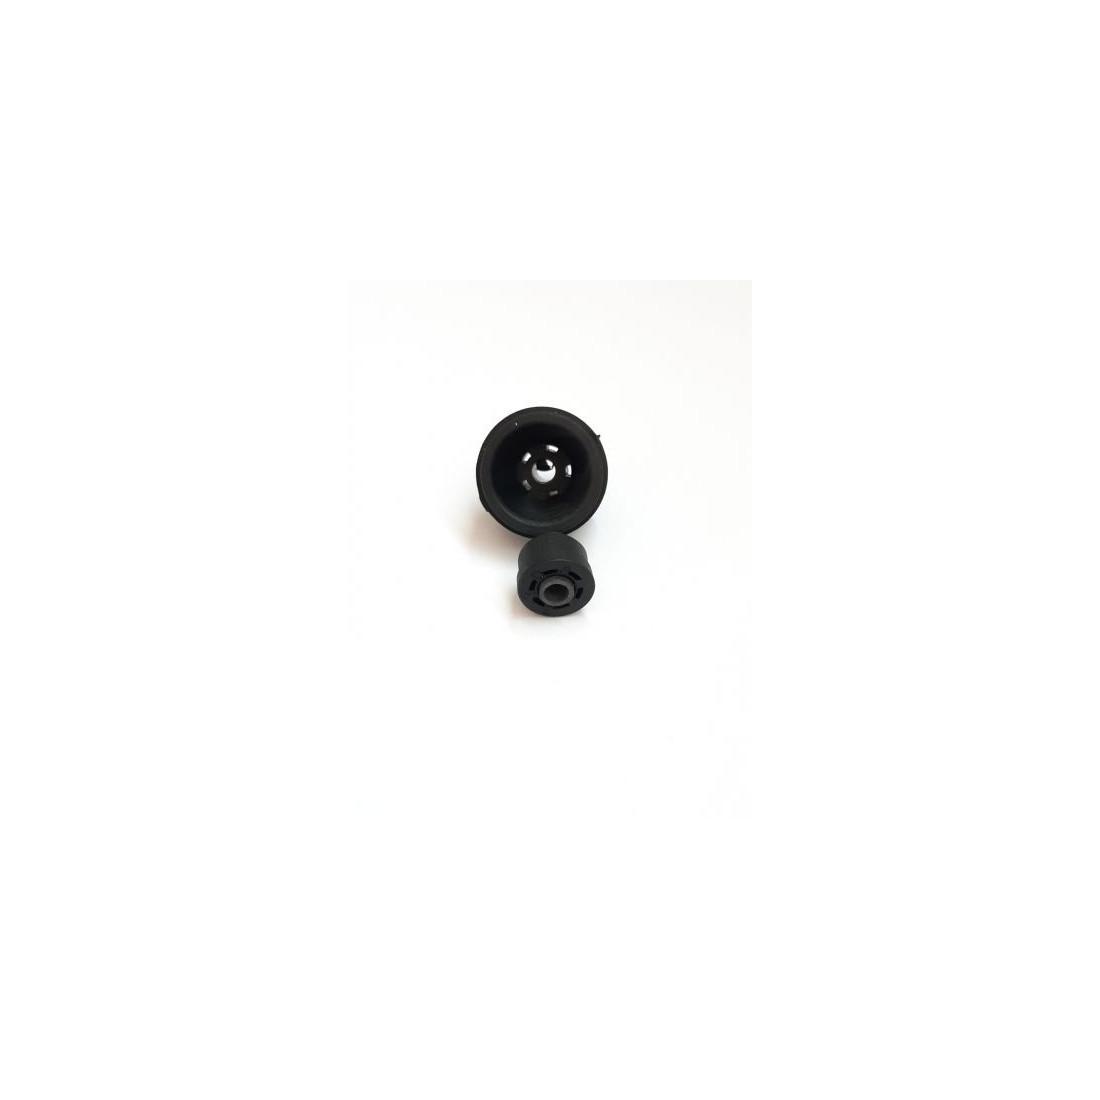 Maxspect Gyre 330 rotor bearings